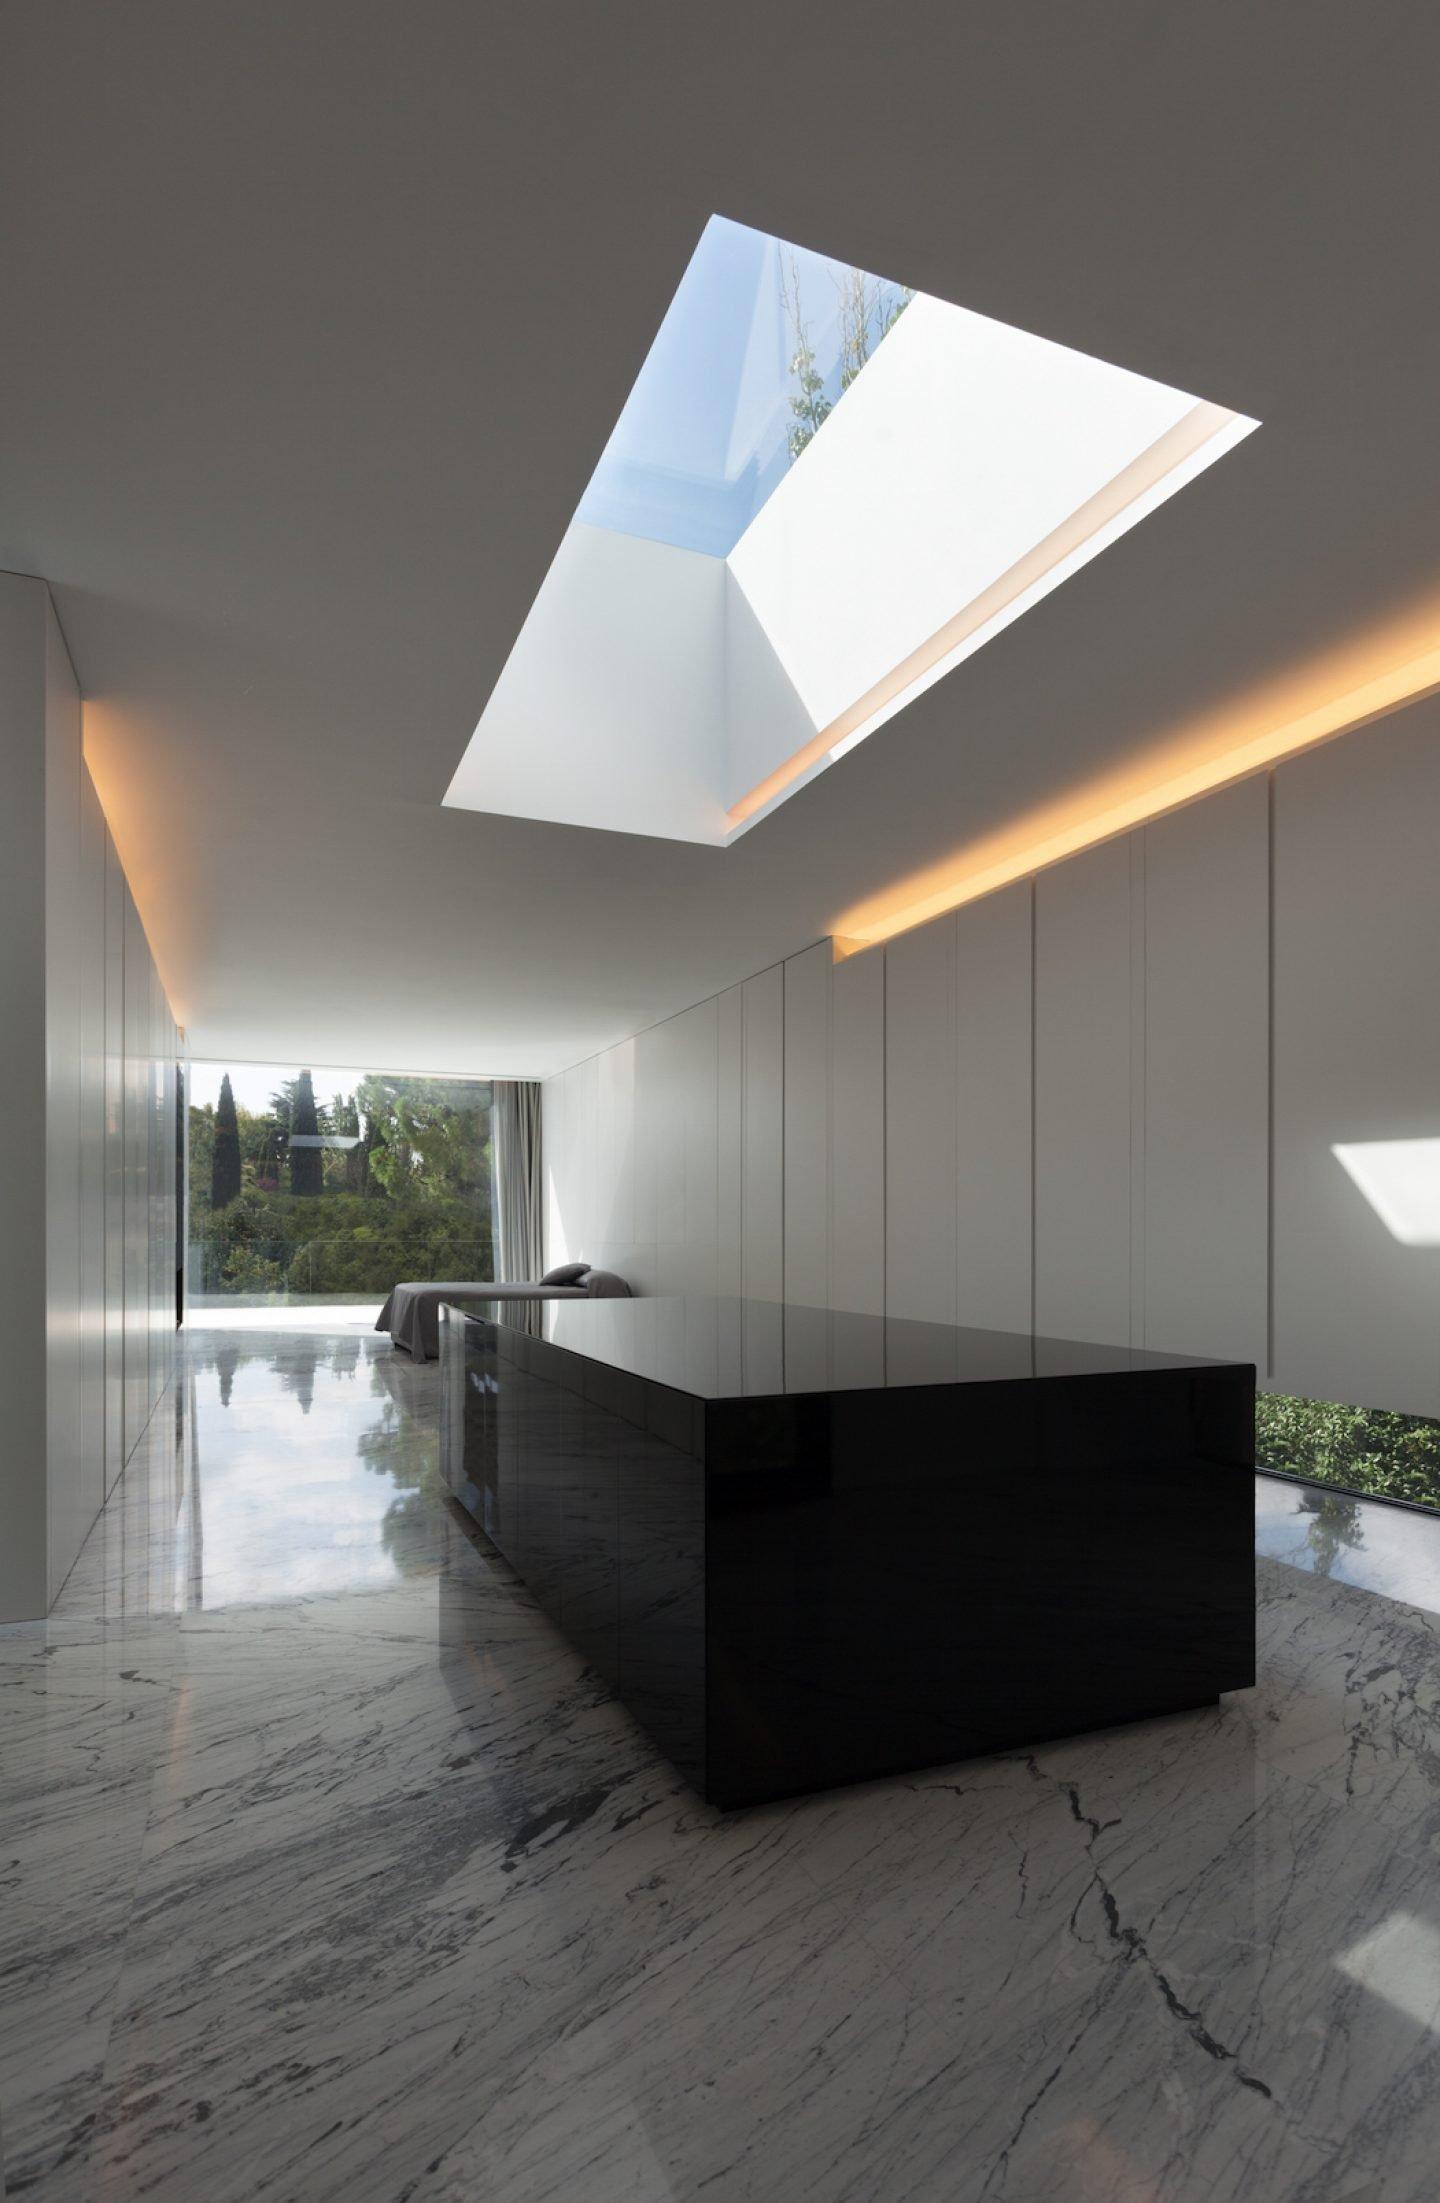 FRAN SILVESTRE ARQUITECTOS - ALUMINUM HOUSE - 016